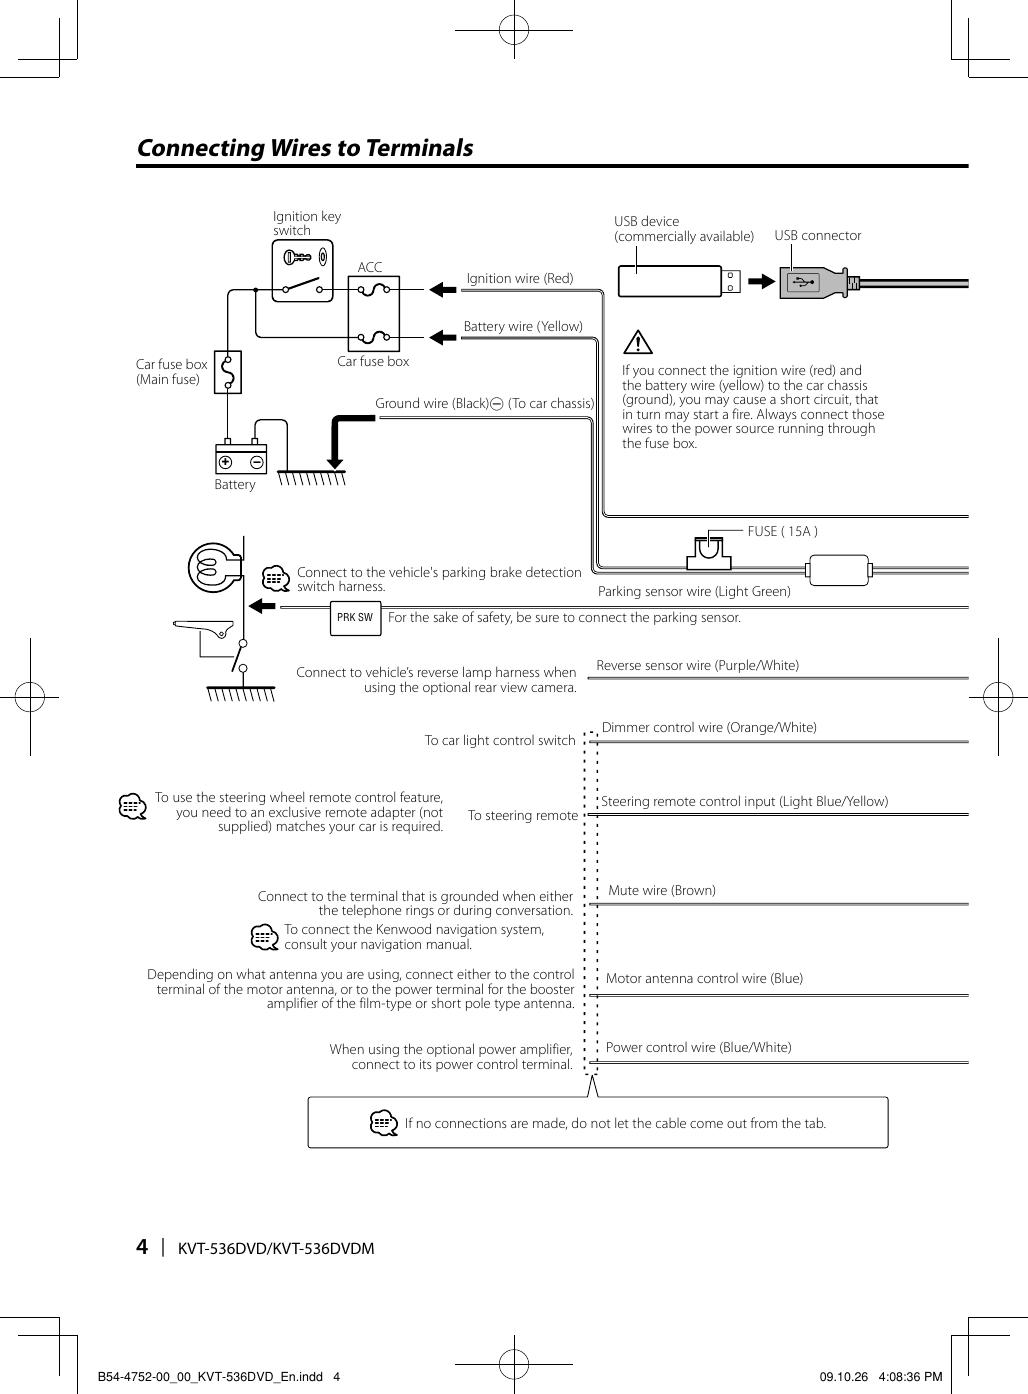 Kenwood Kvt 536dvd Users Manual B54 4752 00 En Car Fuse Box Wiki Page 4 Of 12